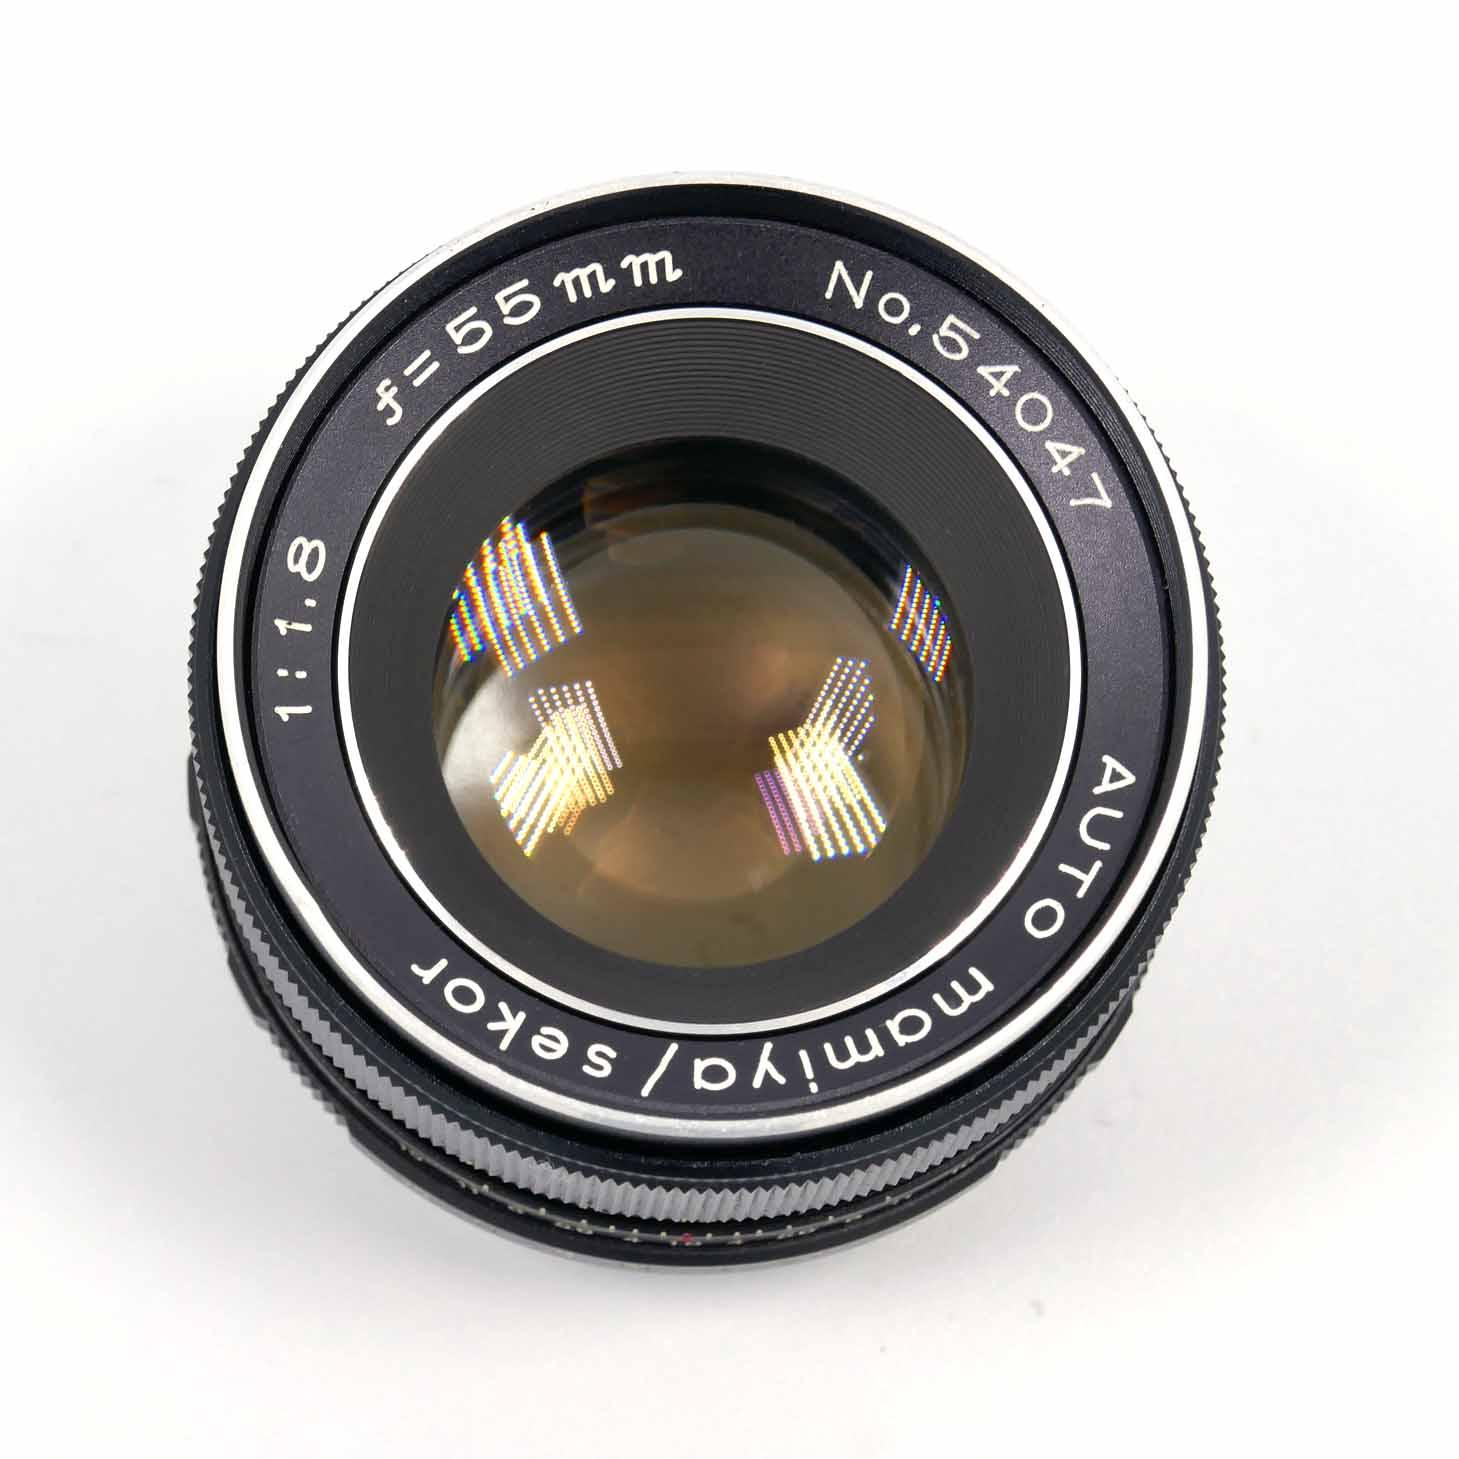 clean-cameras-Auto-Mamiya-Sekor-55mm-1.8-M4203